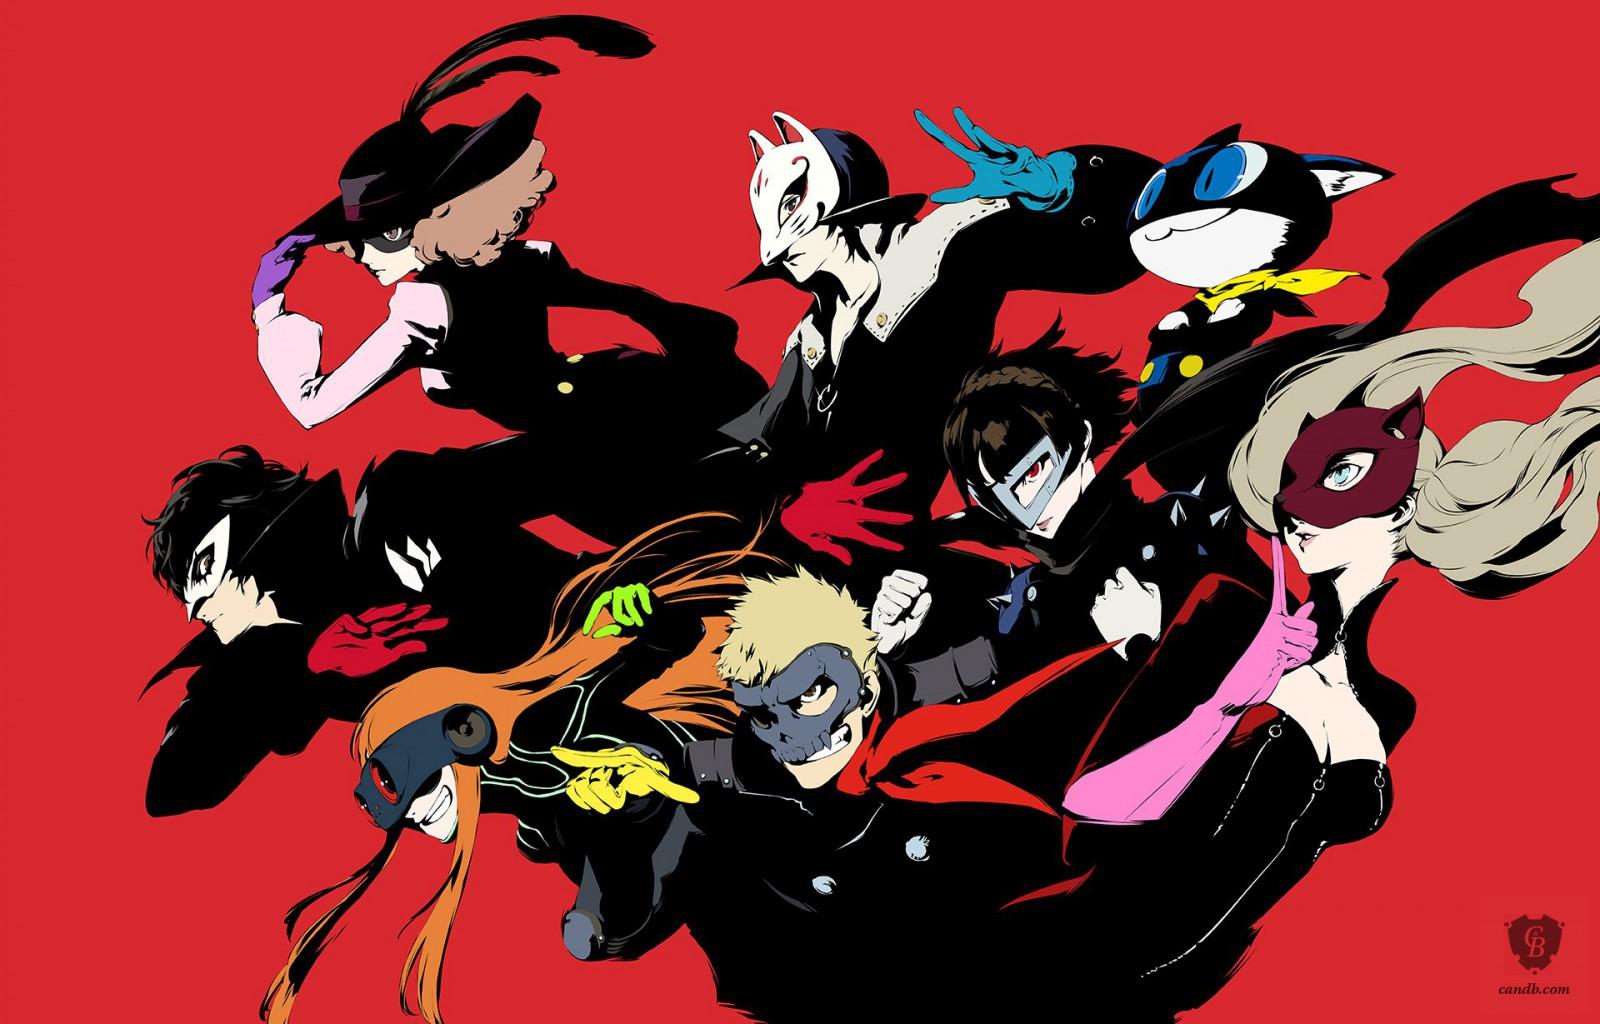 Persona 5 - All Persona Catalysts & Awakenings | Persona 5, Persona, Anime